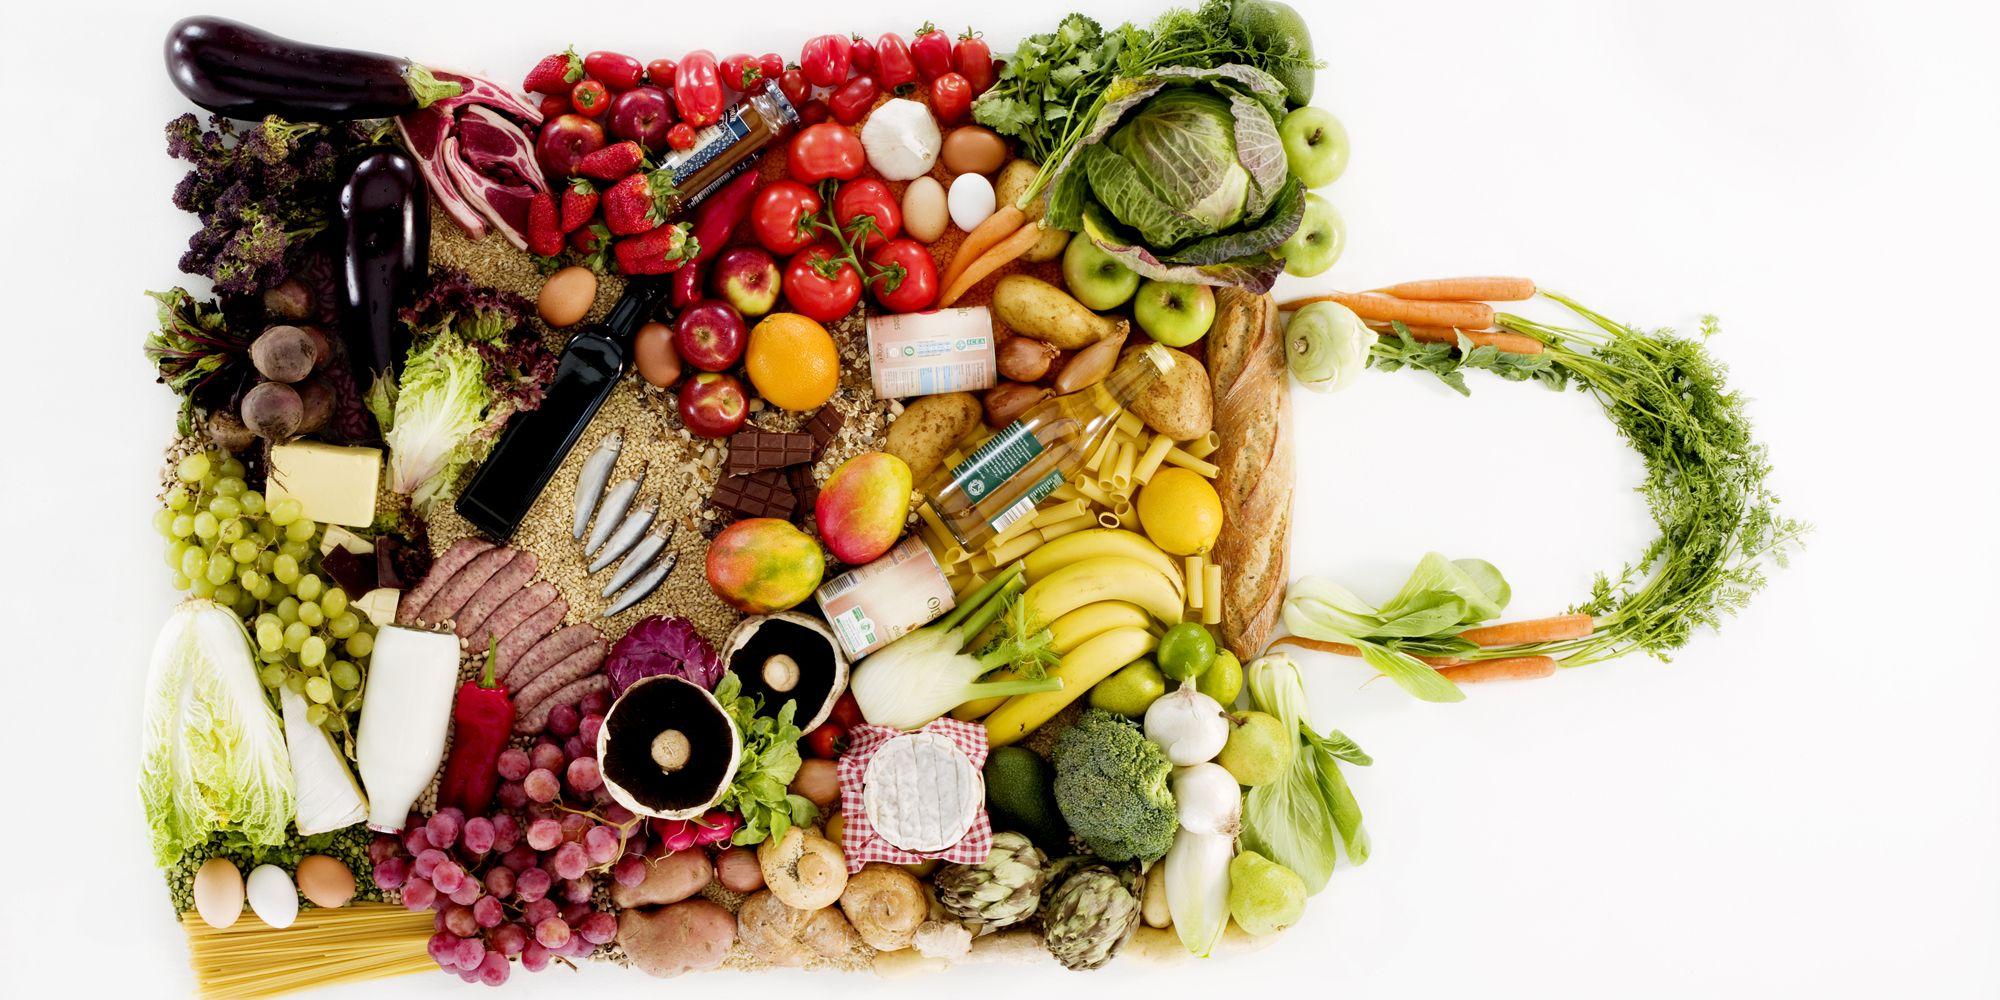 dieta vegana per i corridoria